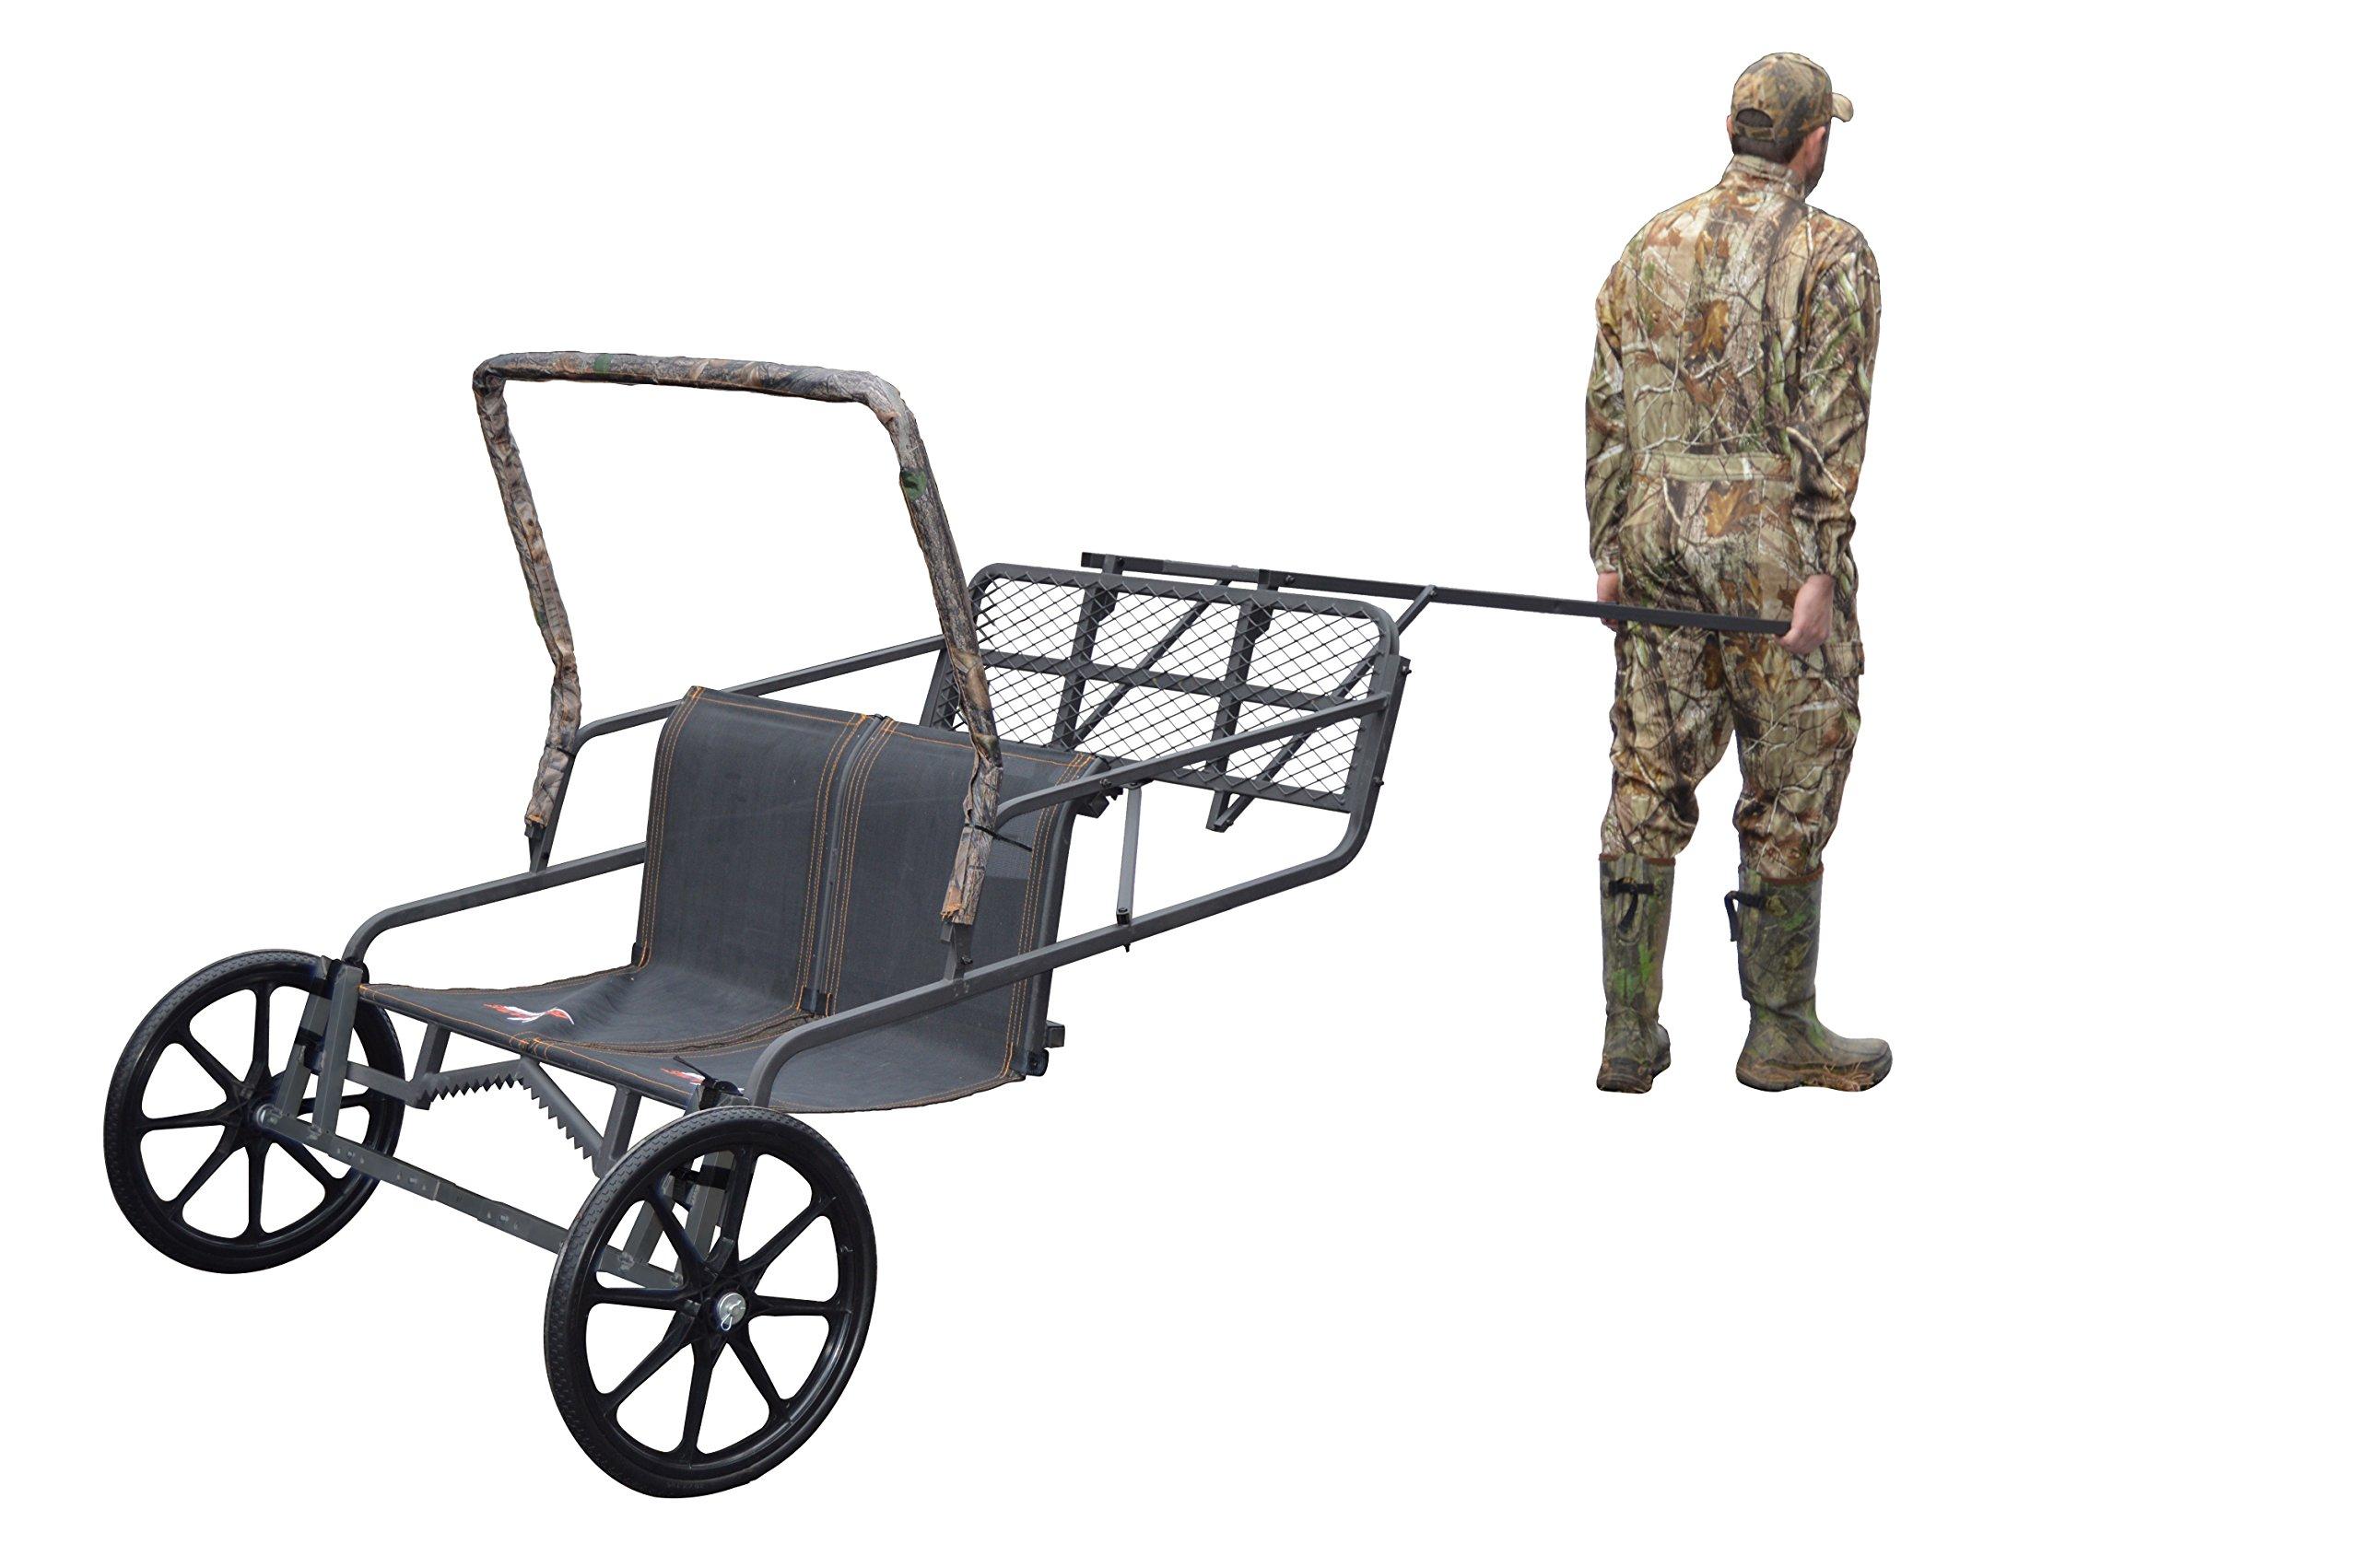 Universal Ladder Stand Wheel Kit - 20'' Wheels